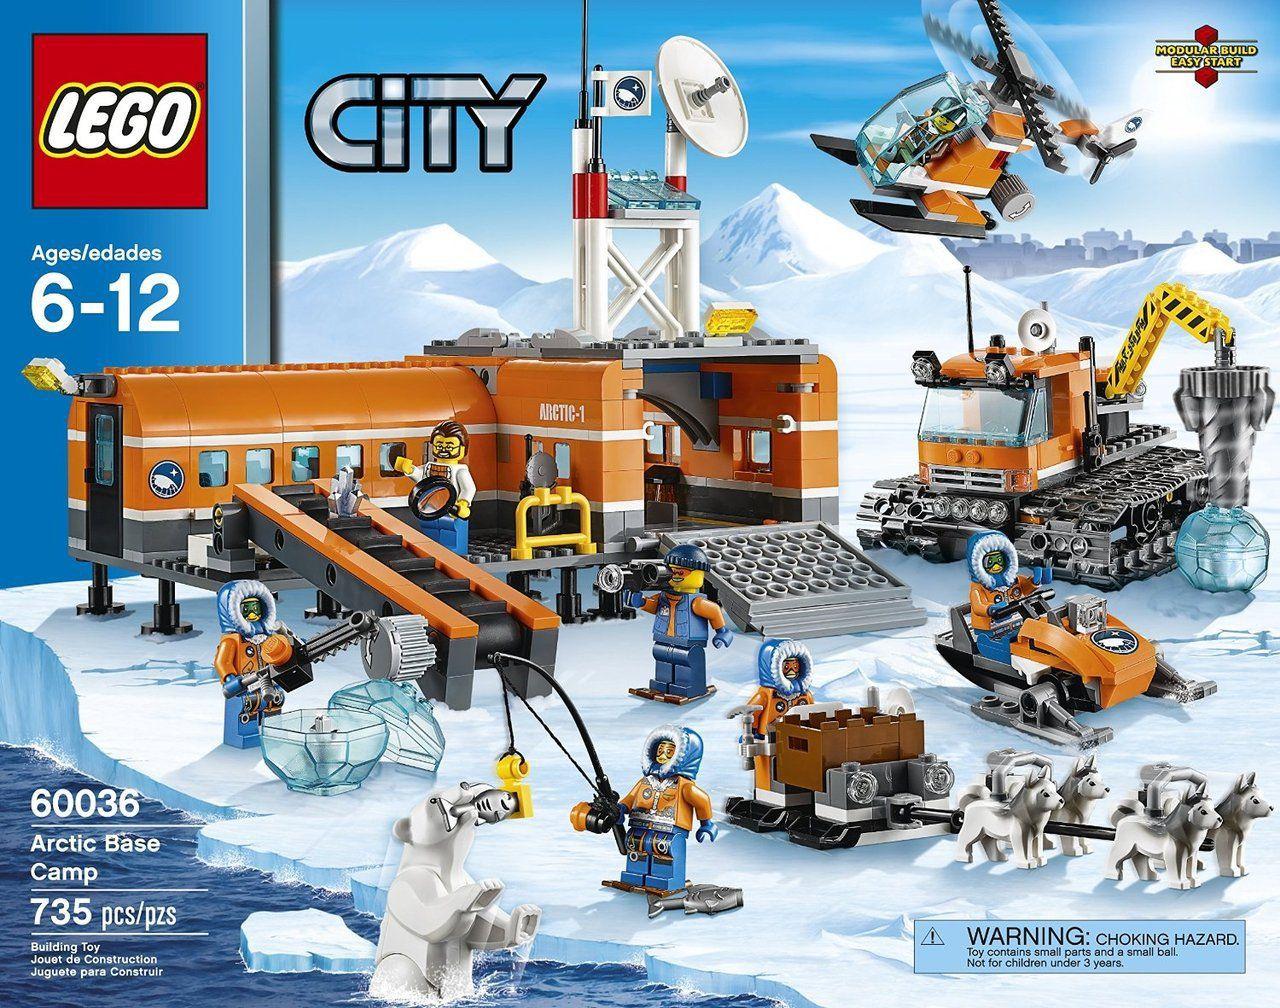 Lego City Arctic Basecamp 60036 Lego City Sets Lego City Lego Sets